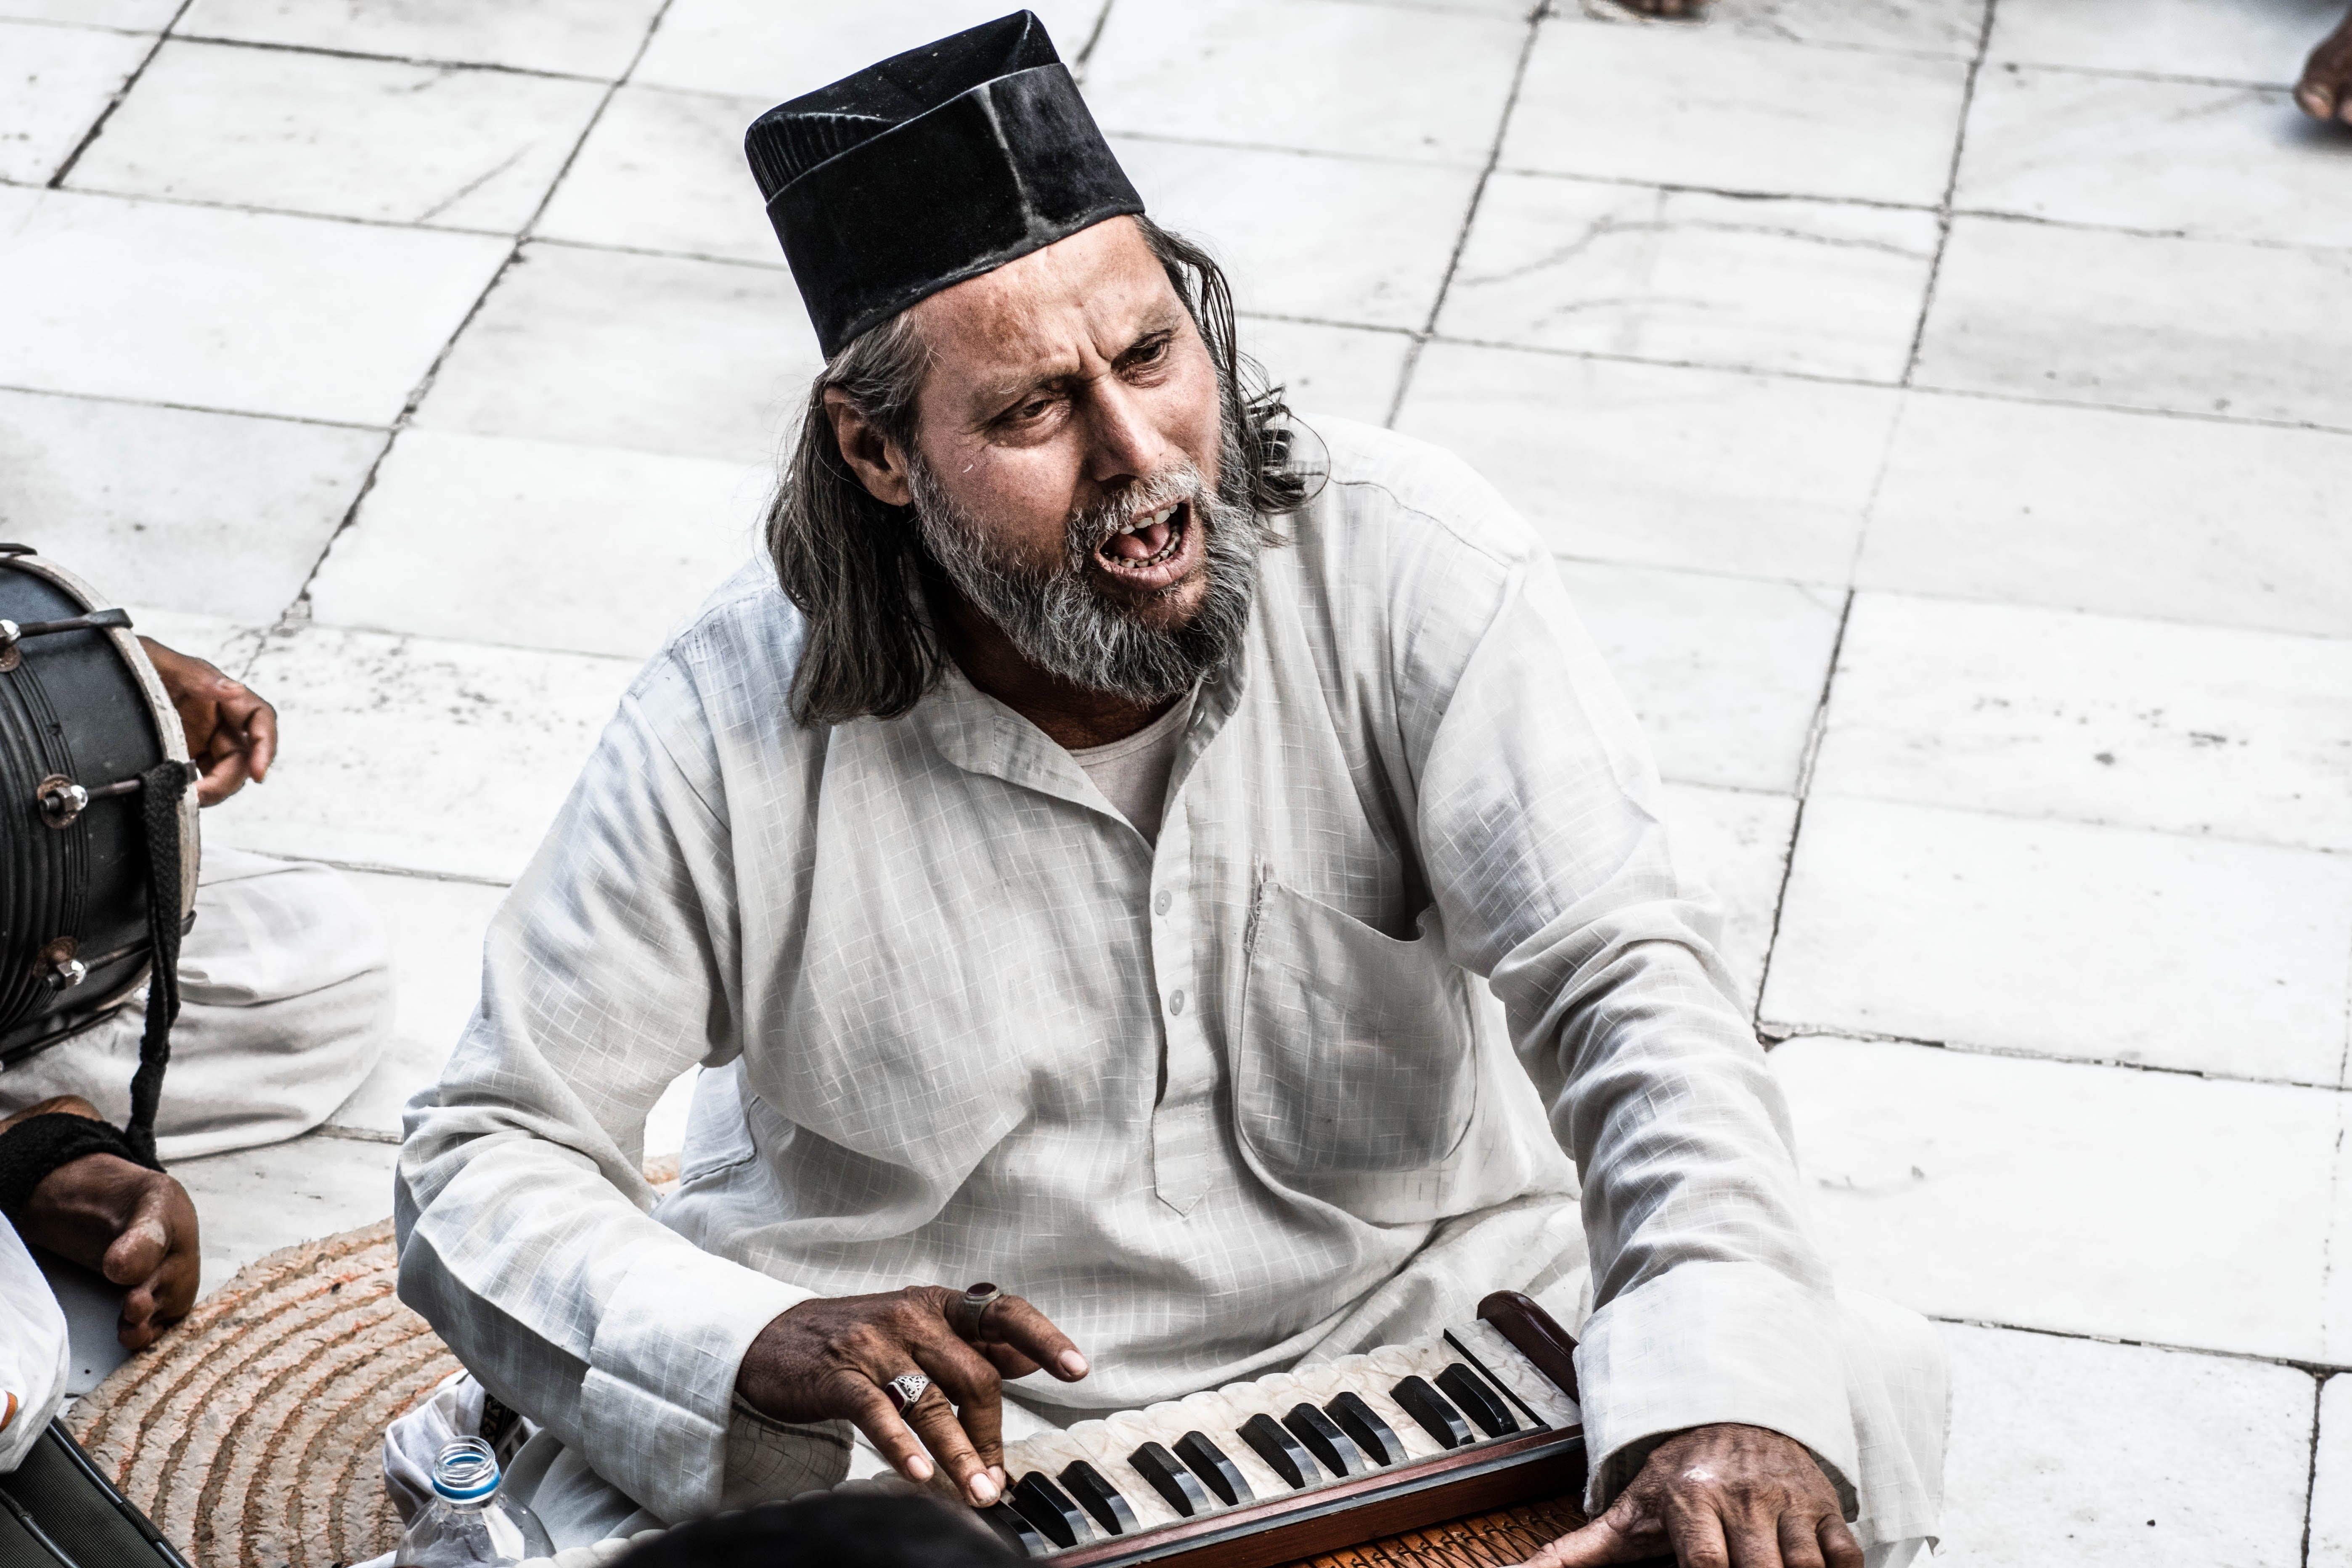 Man Sitting Holding Instrument